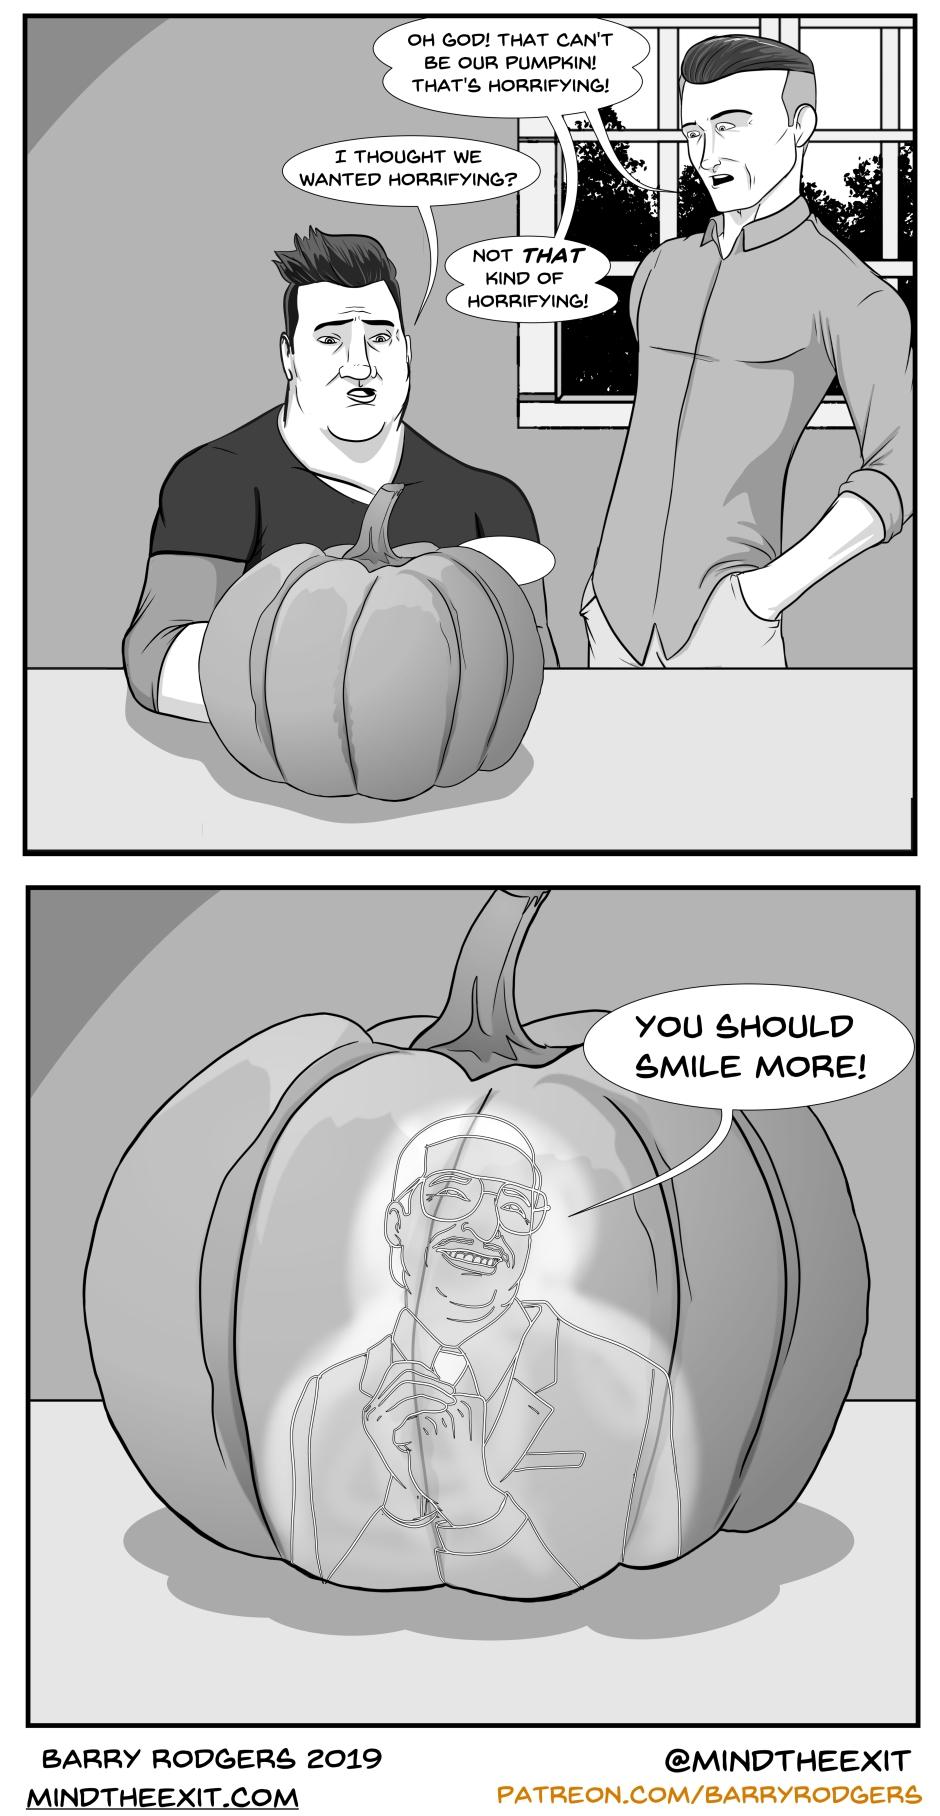 carving the pumpkin1